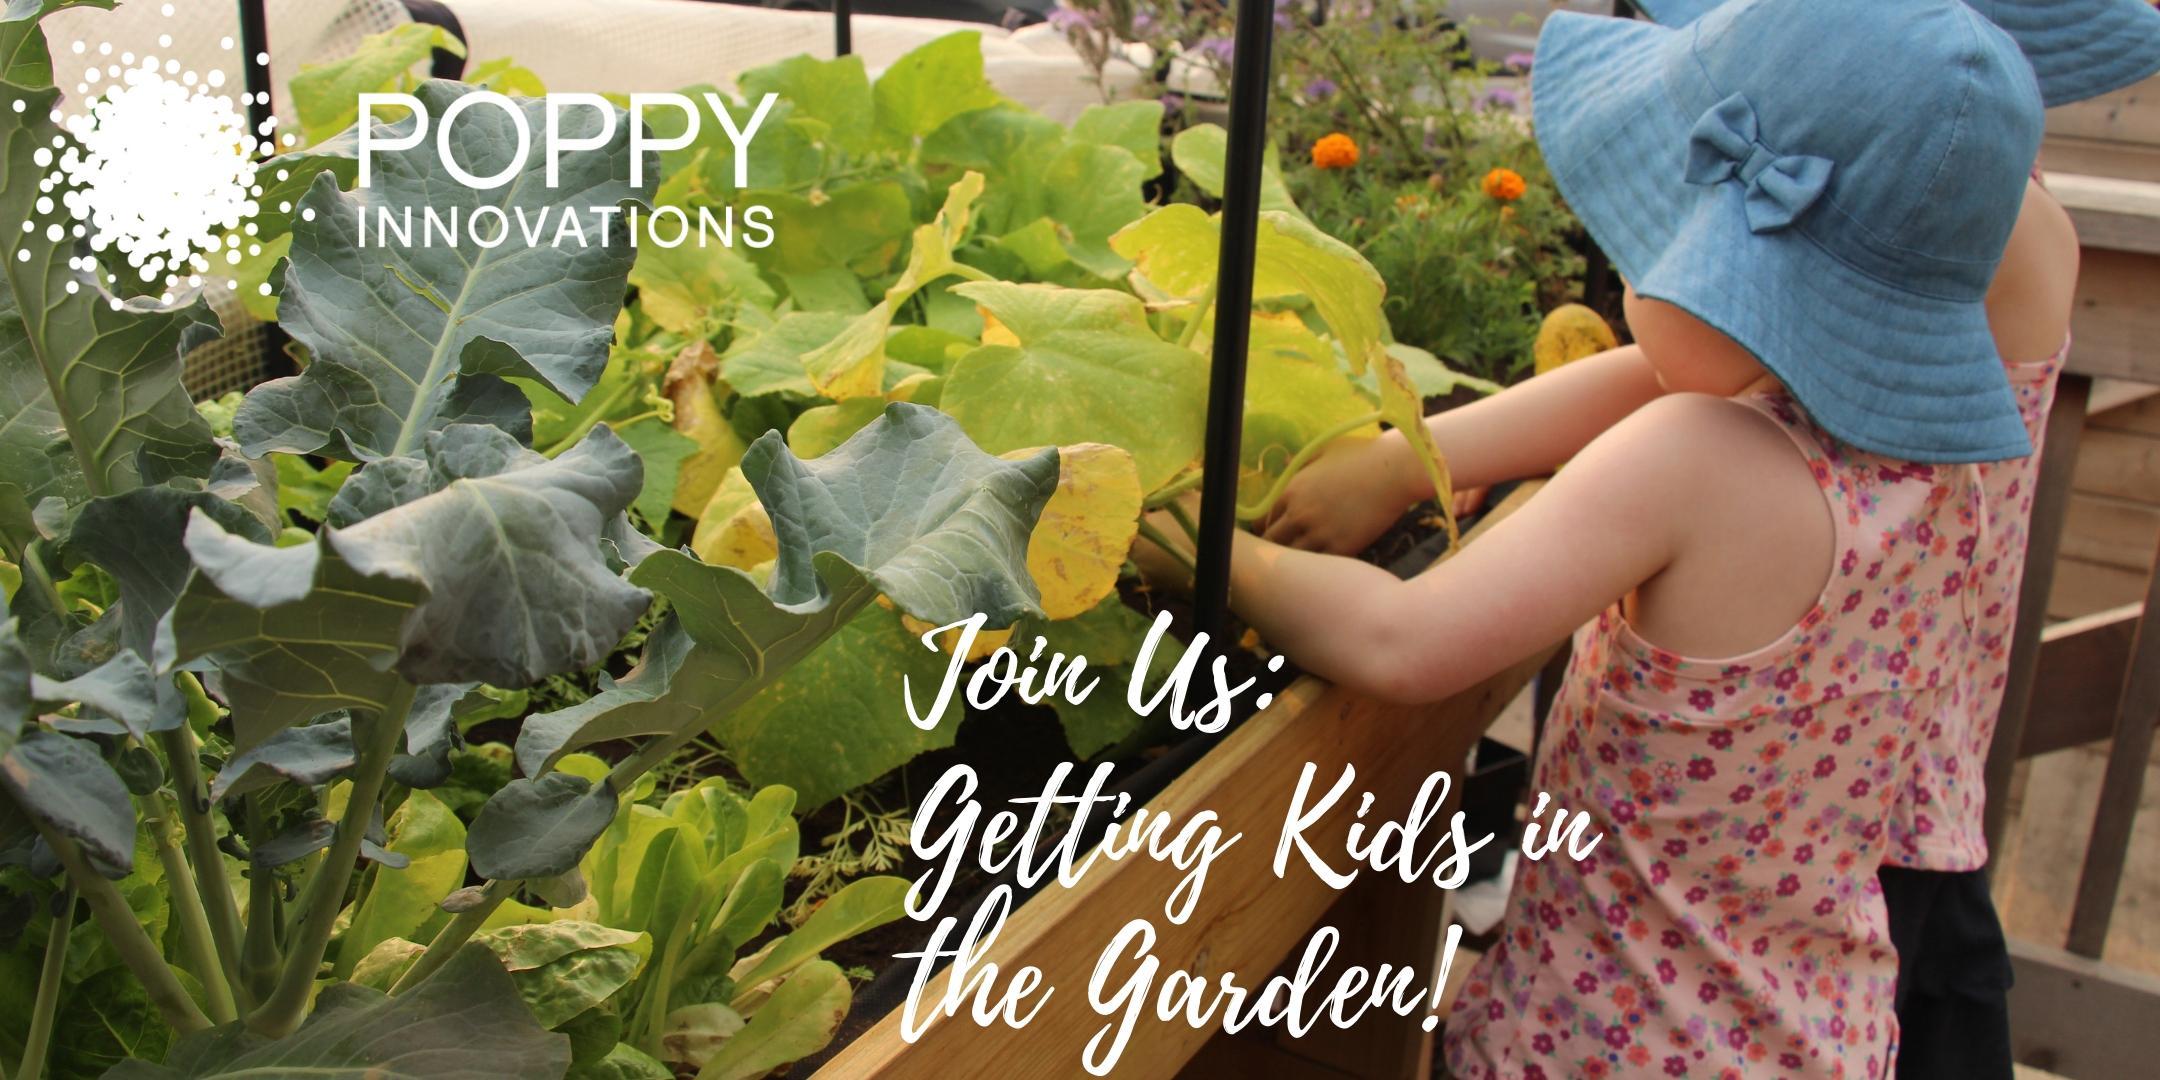 Getting Kids In The Garden!